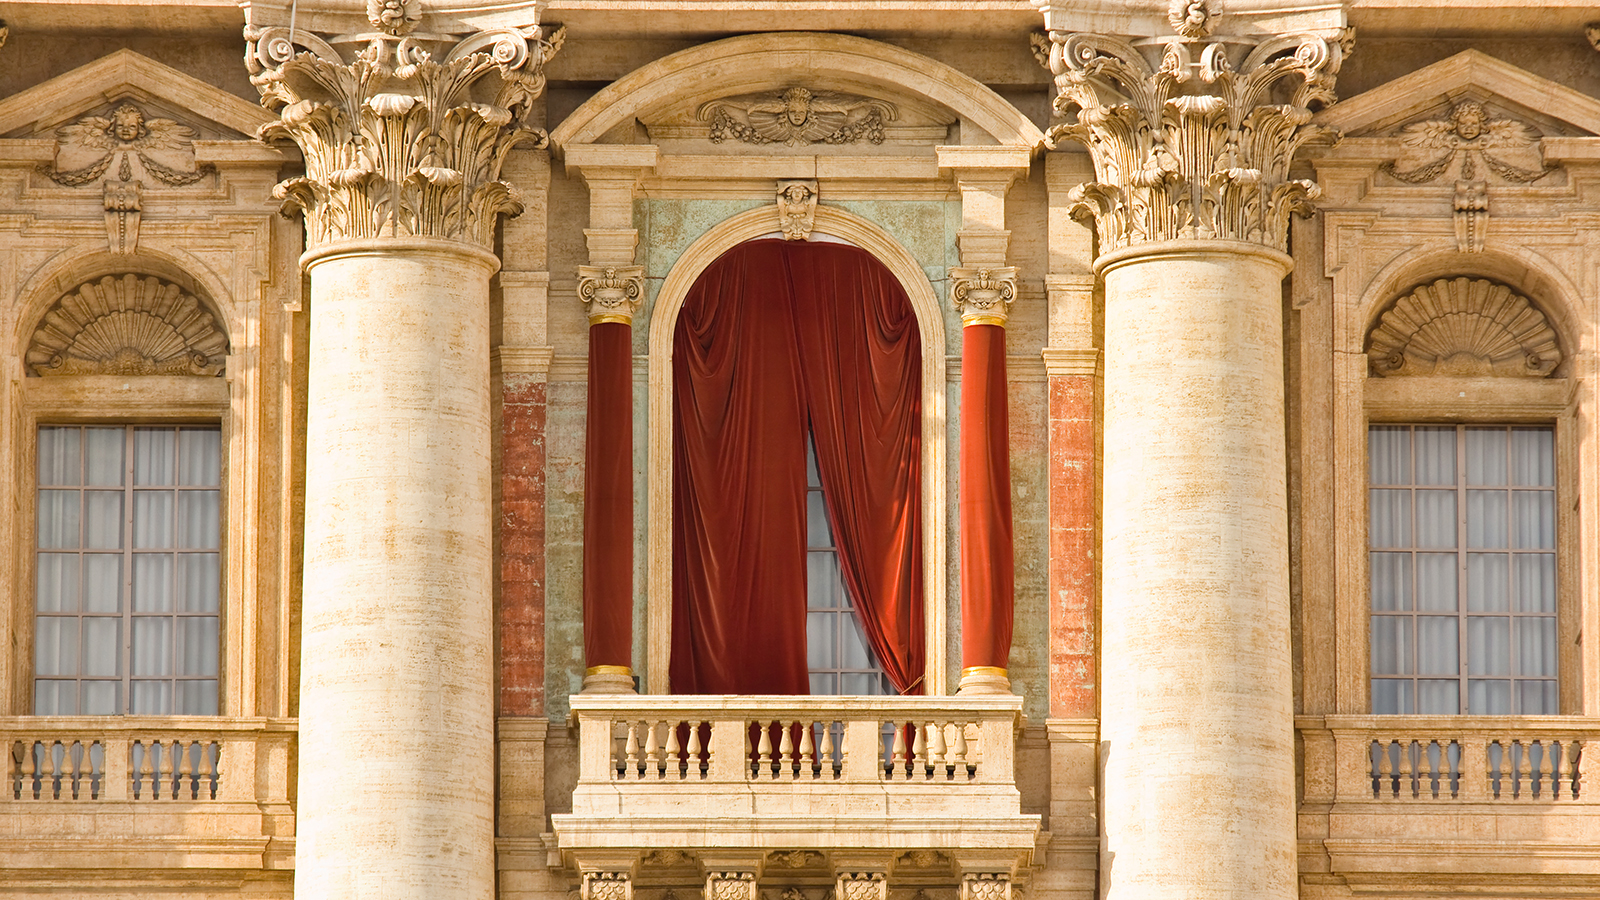 St. Peter's Basilica window where the Pope addresses the faithful.